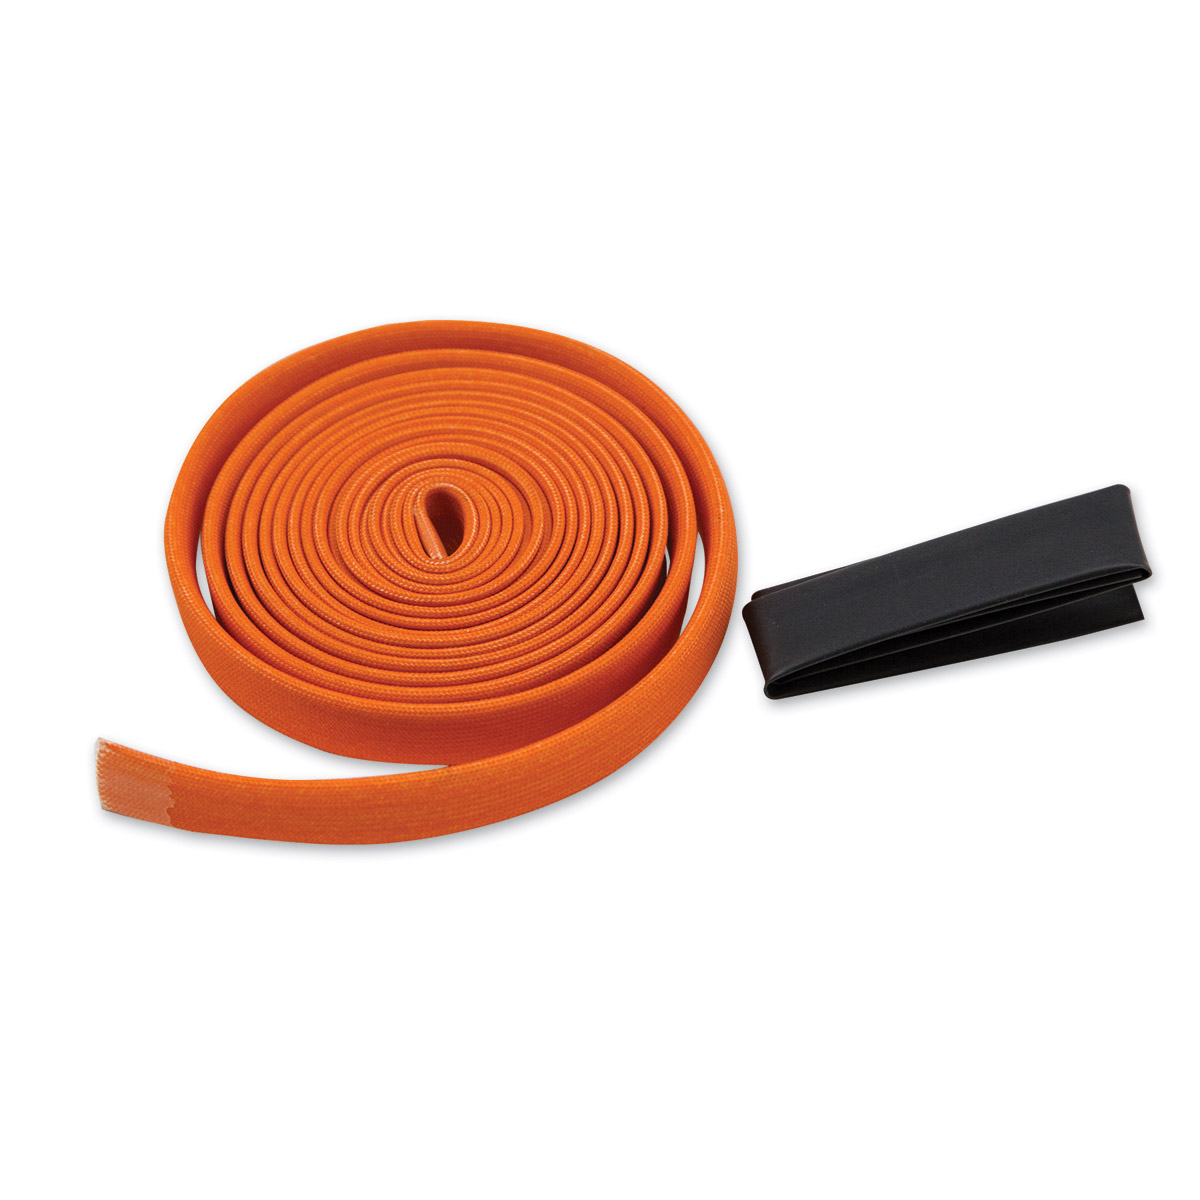 Design engineering inc orange 10mm sleeving 754 577 j for Product design inc